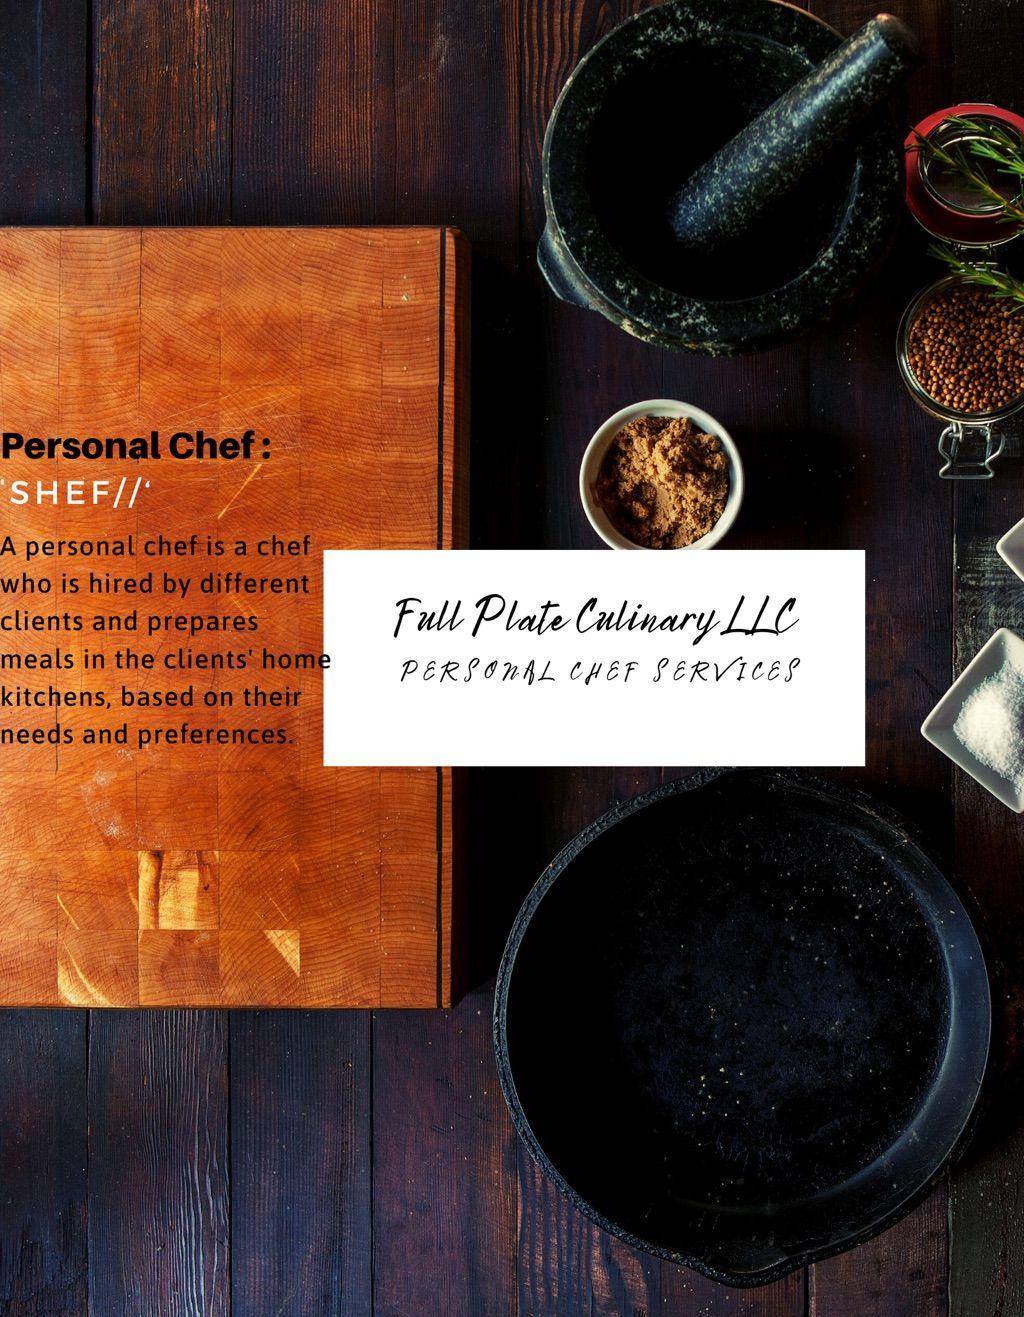 Full Plate Culinary LLC